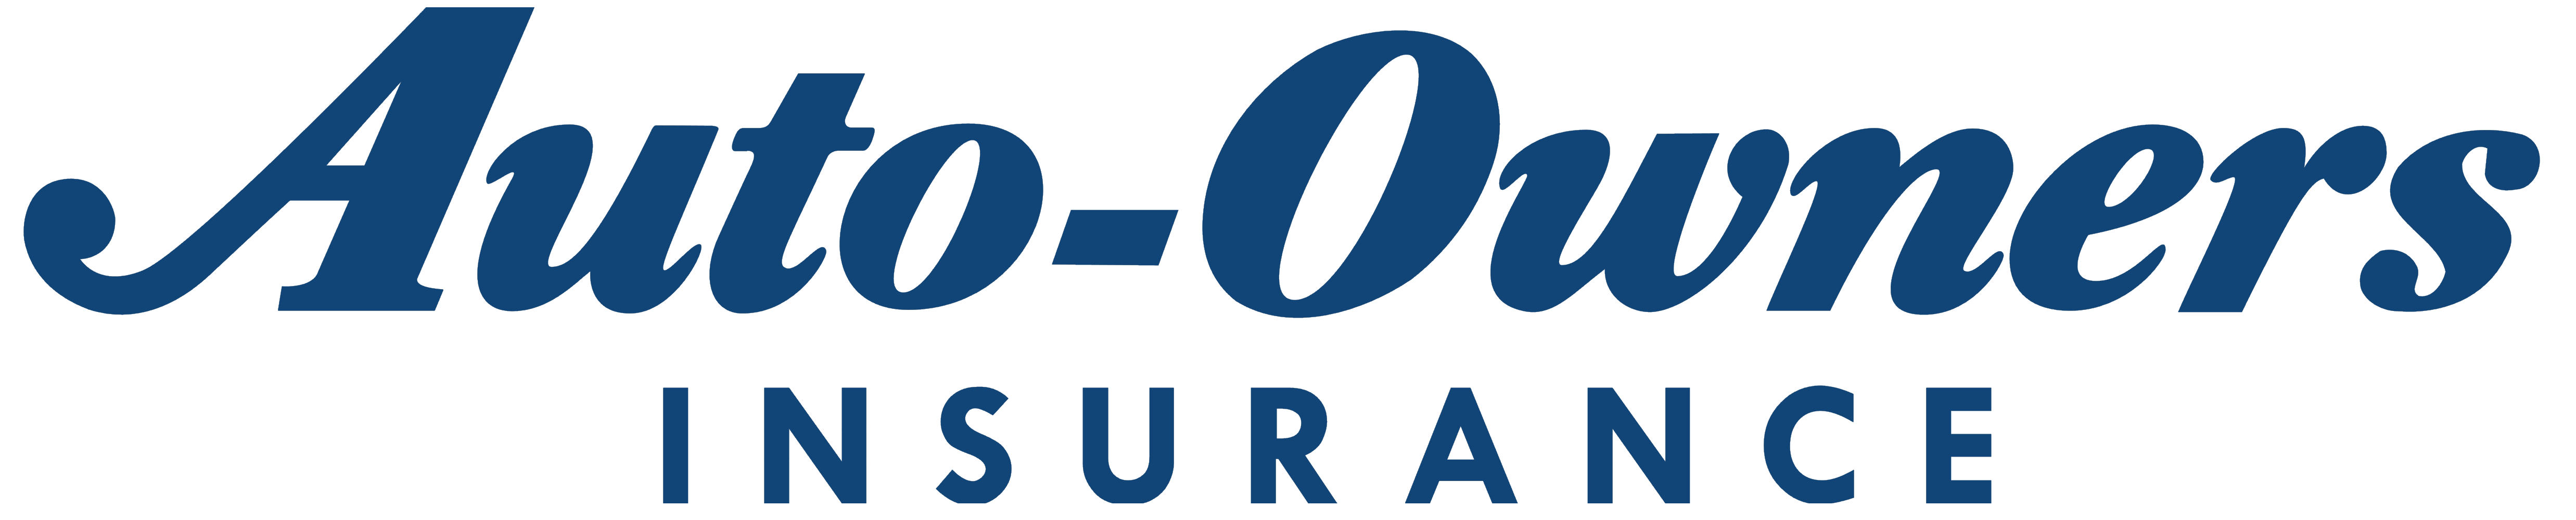 Auto-Owners_Insurance_logo elite pt